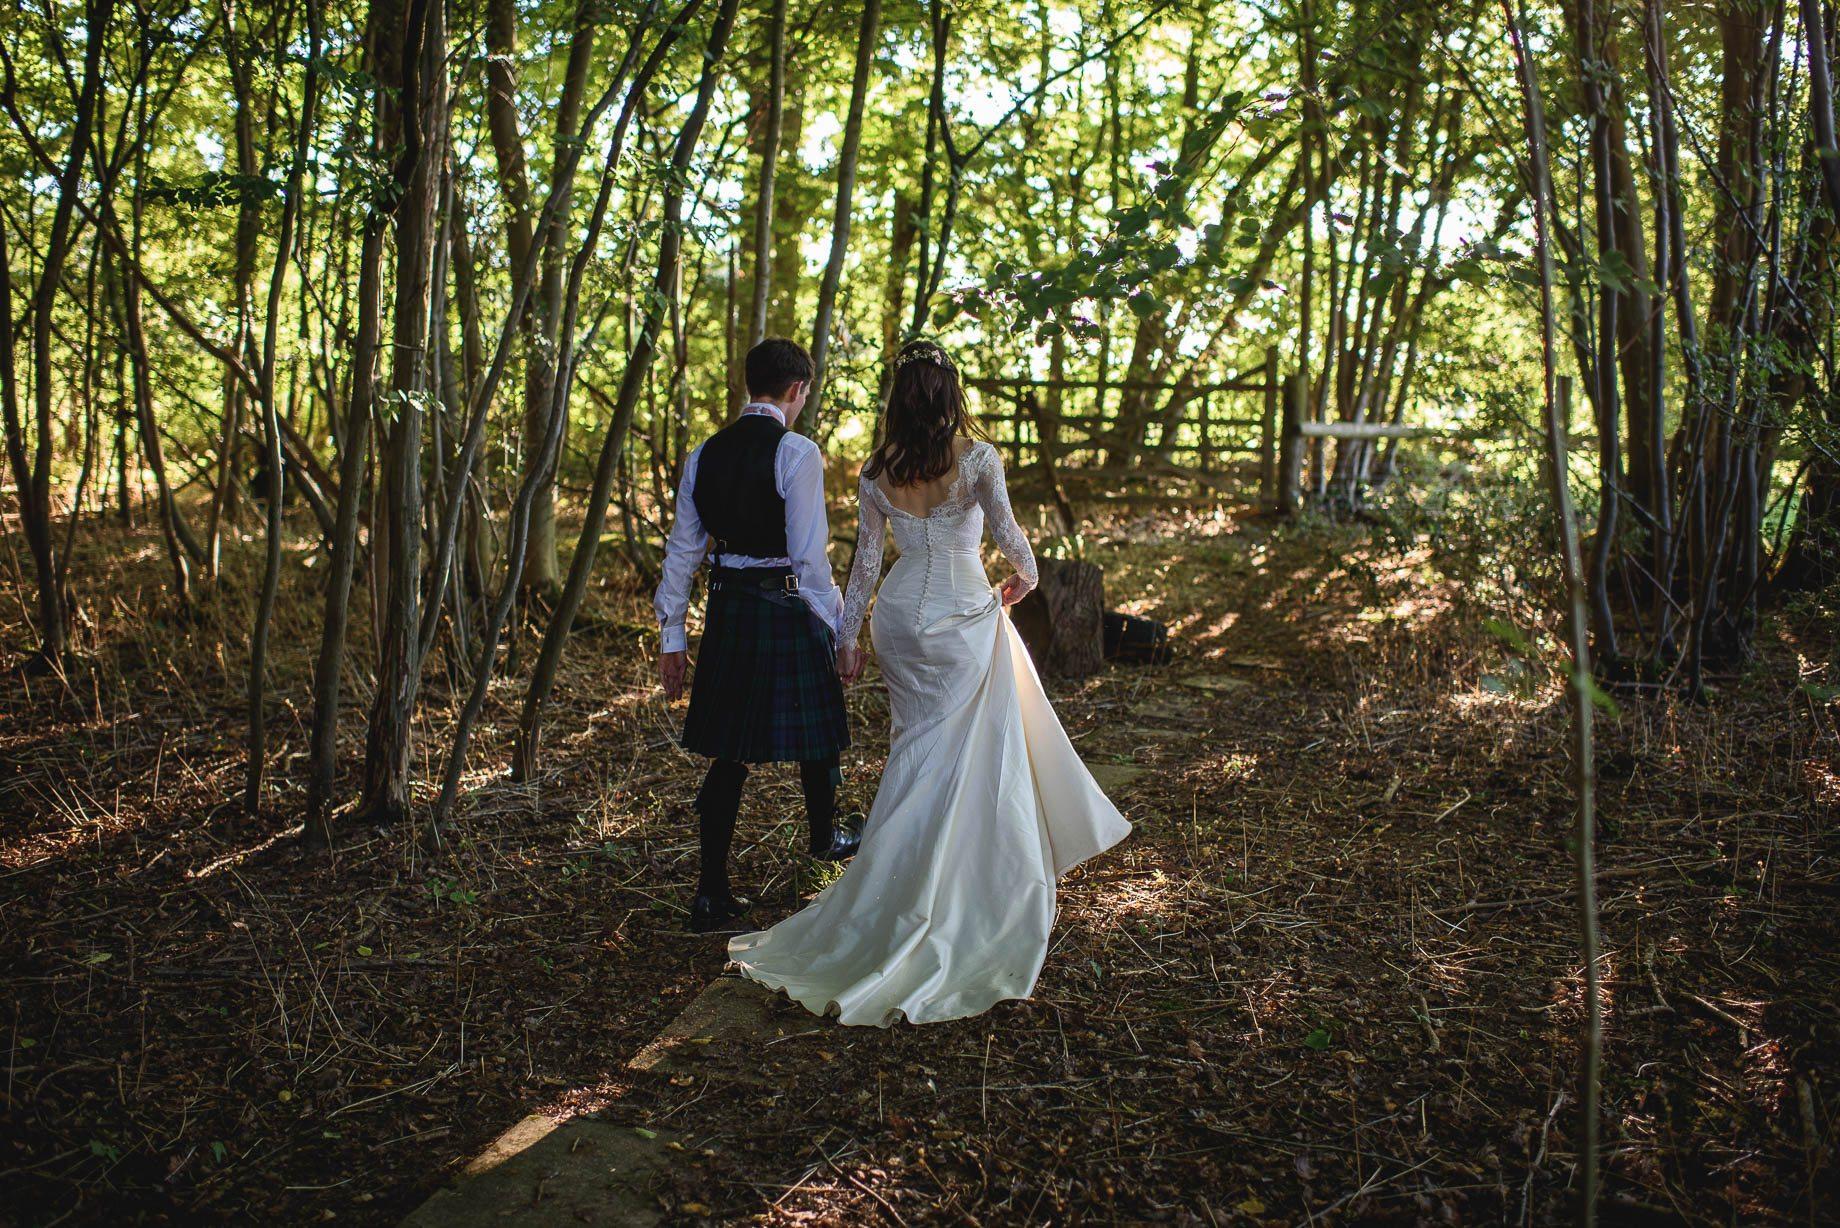 Gildings Barn wedding photography - Sarah and Steve (163 of 190)